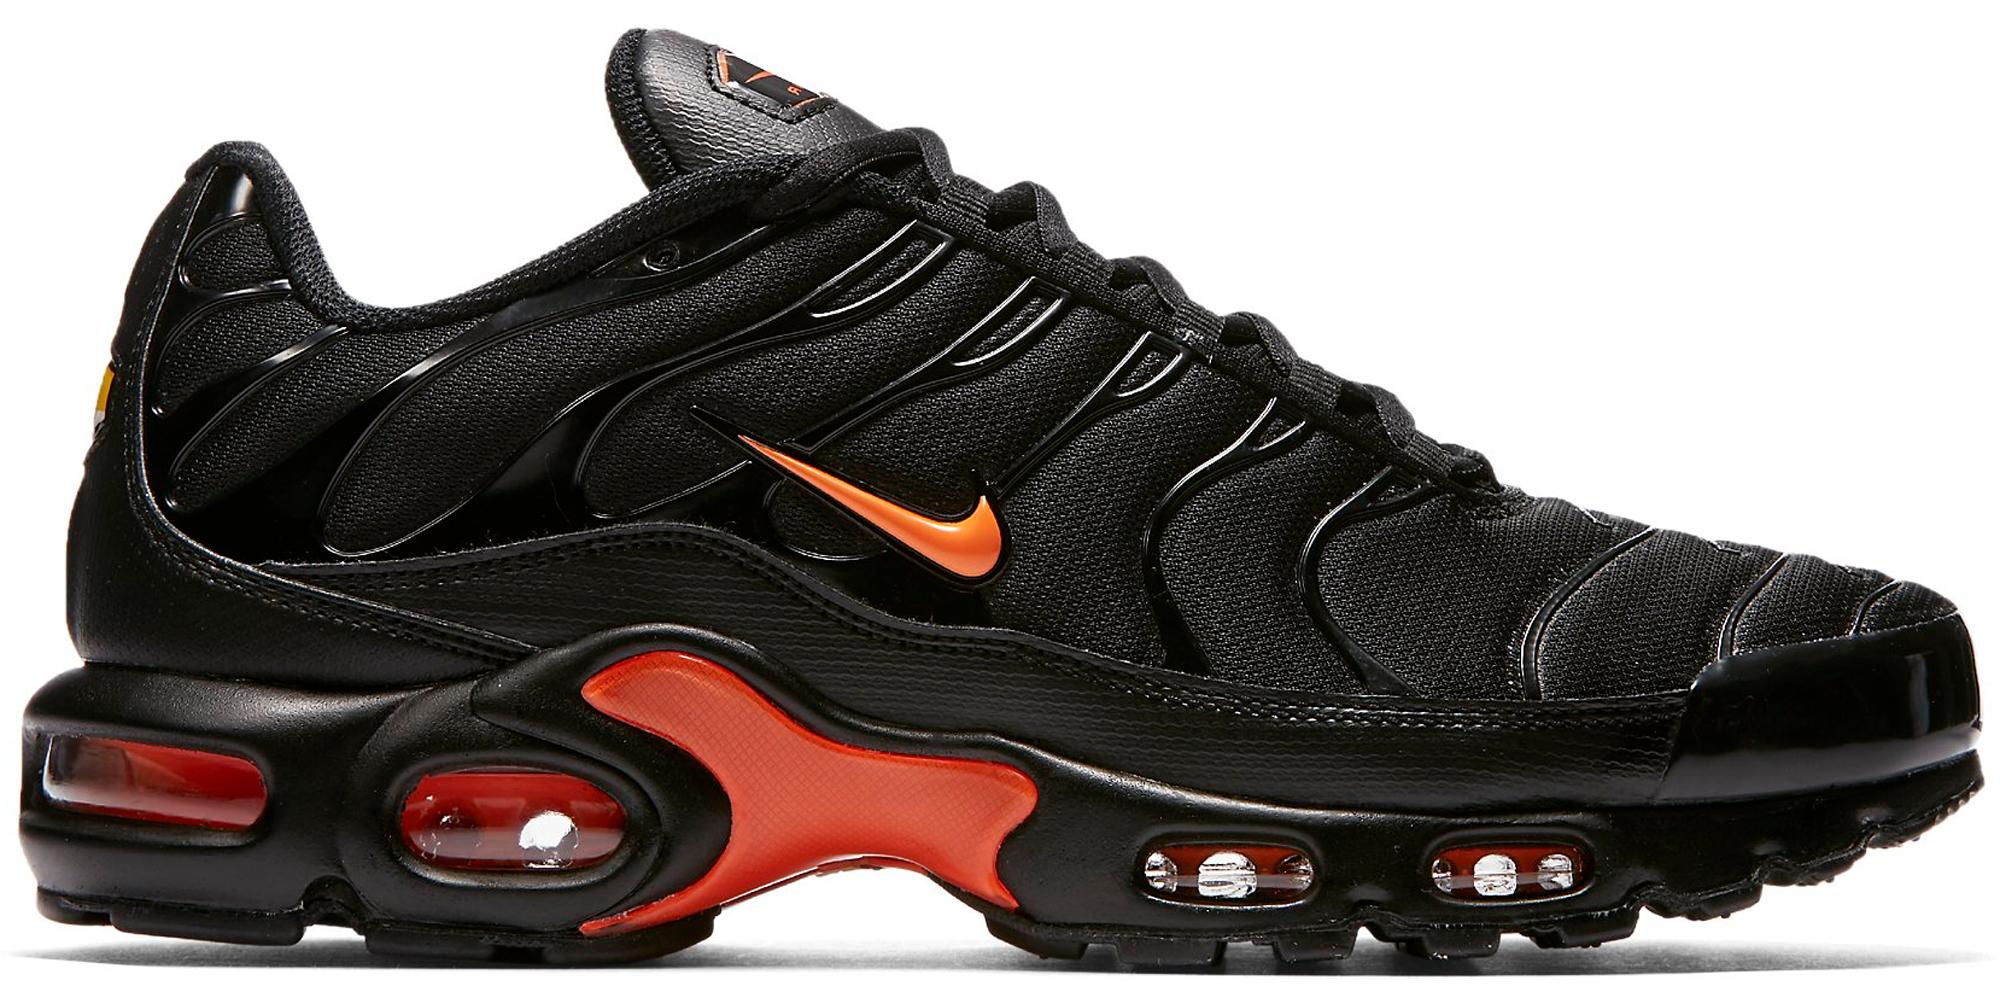 nike 95 black and orange